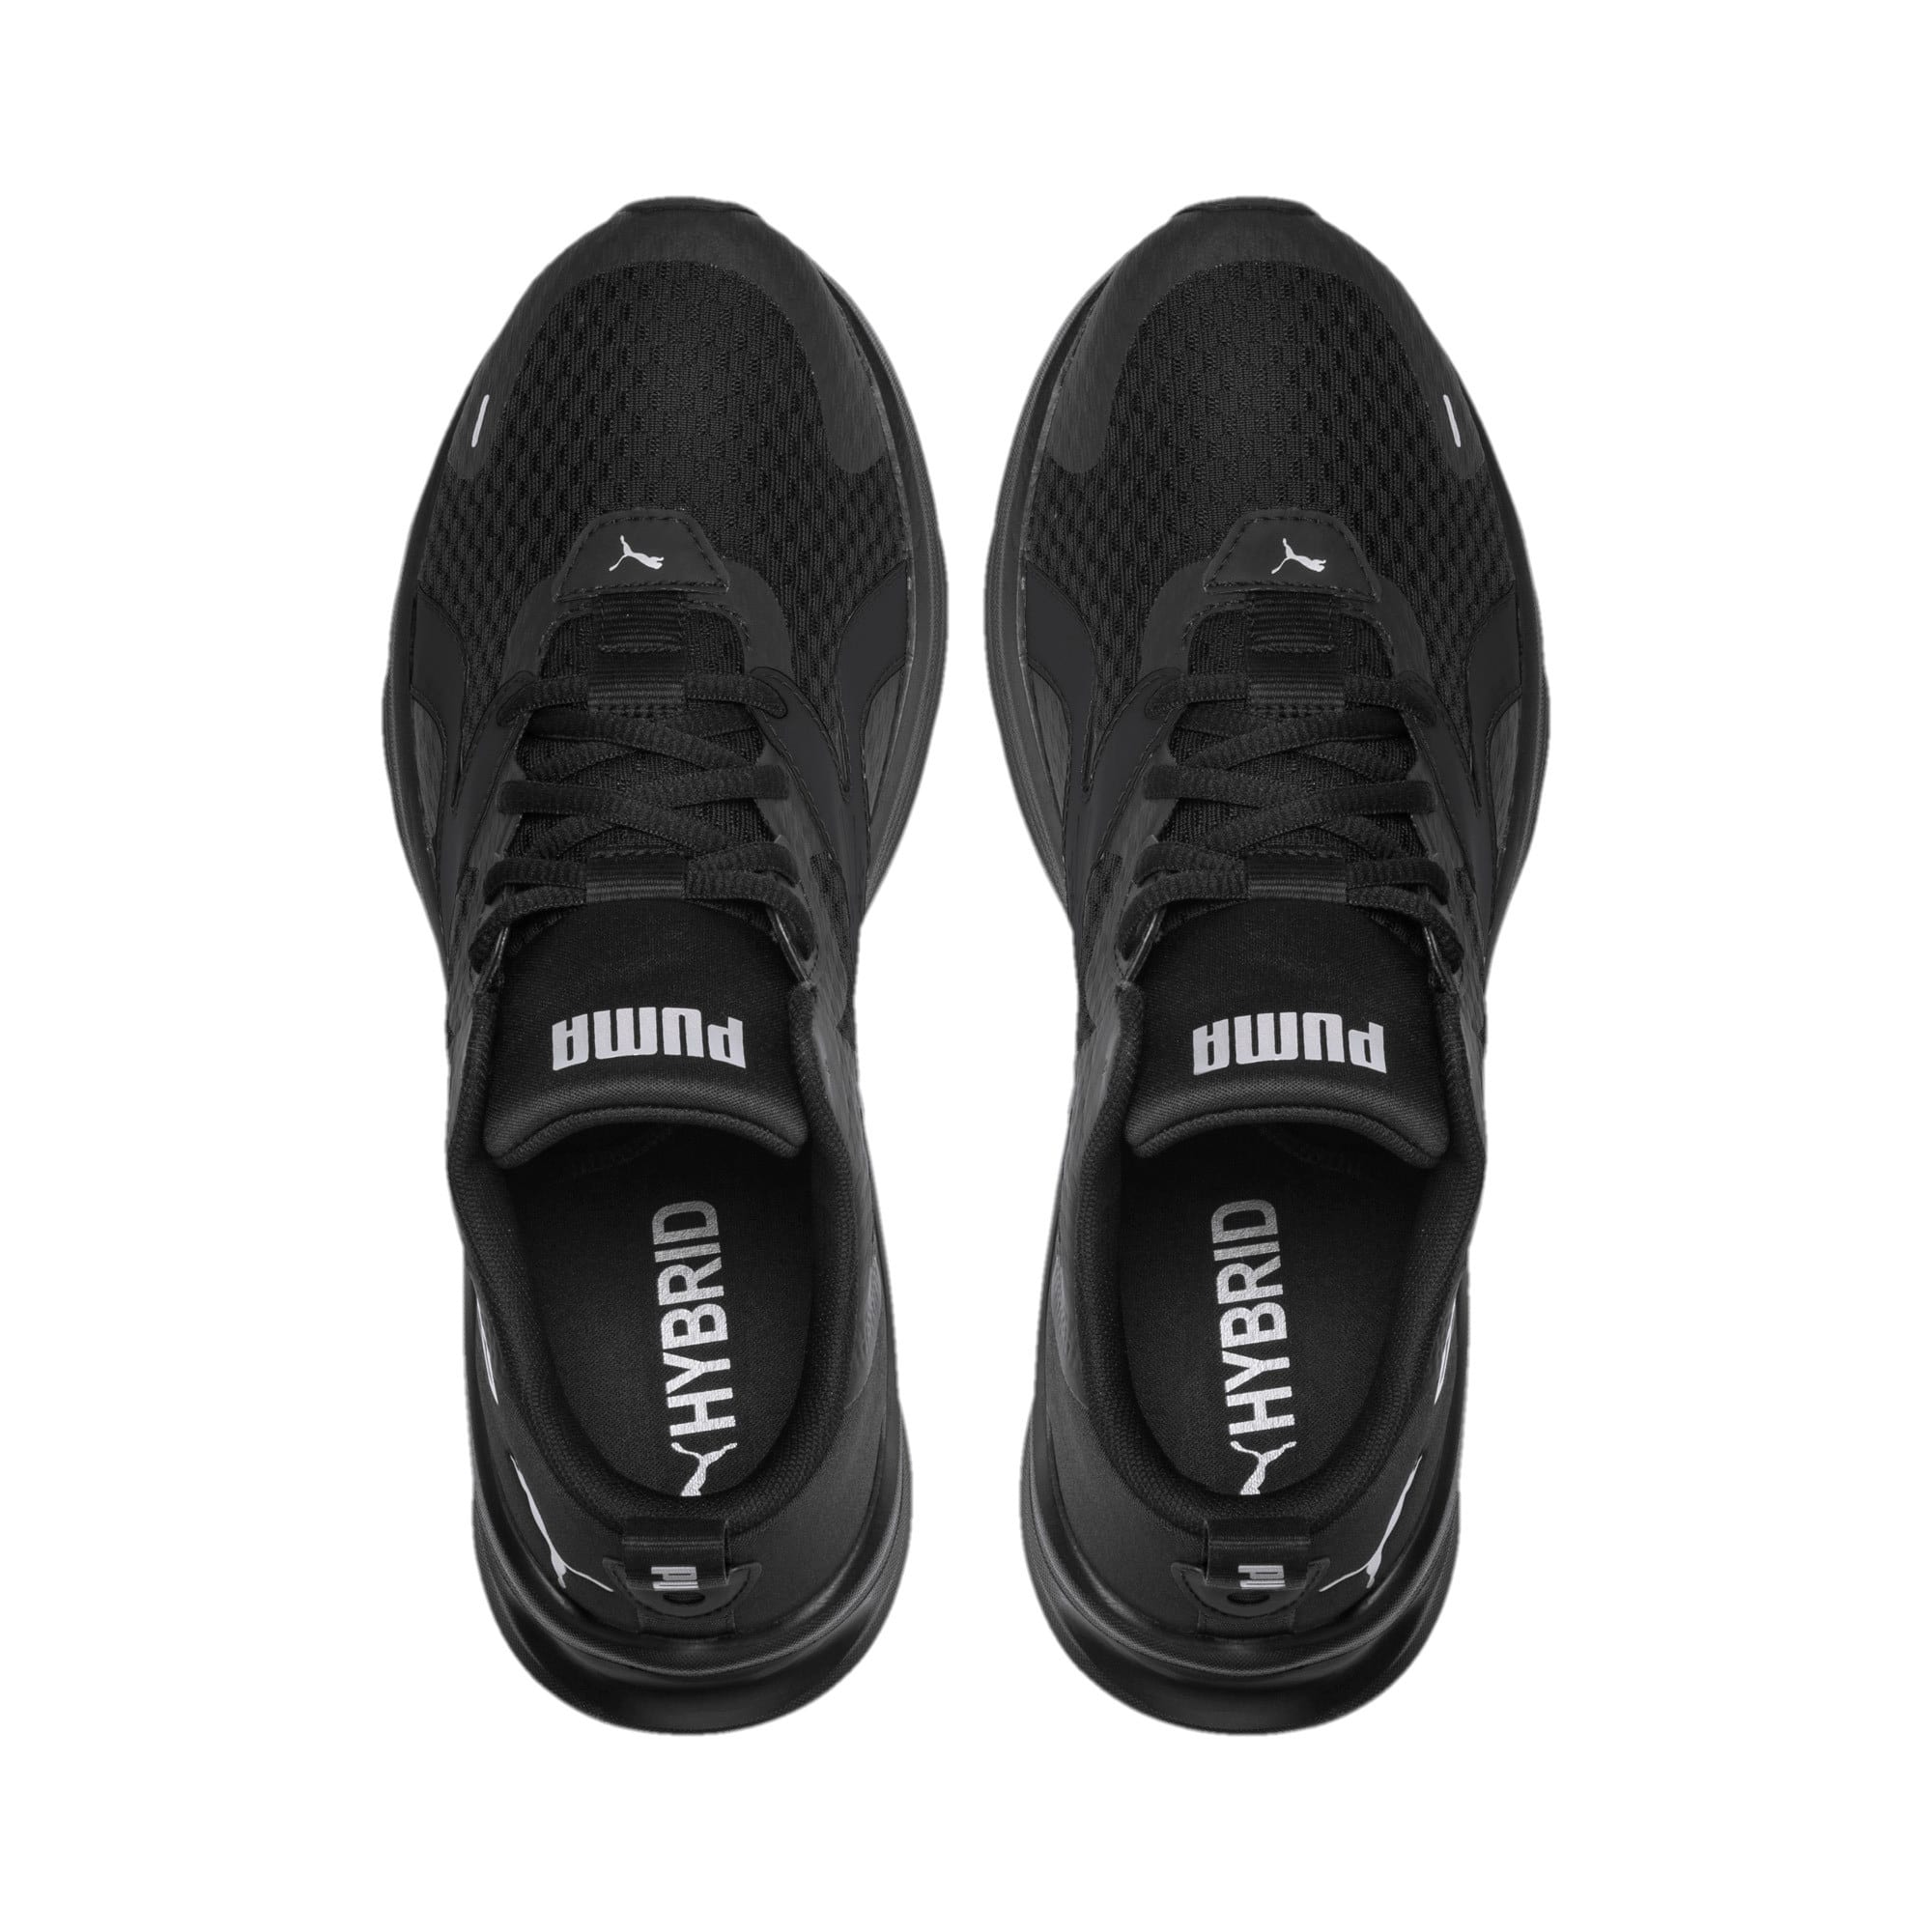 Thumbnail 7 of HYBRID Fuego Men's Running Shoes, Puma Black-Puma Black, medium